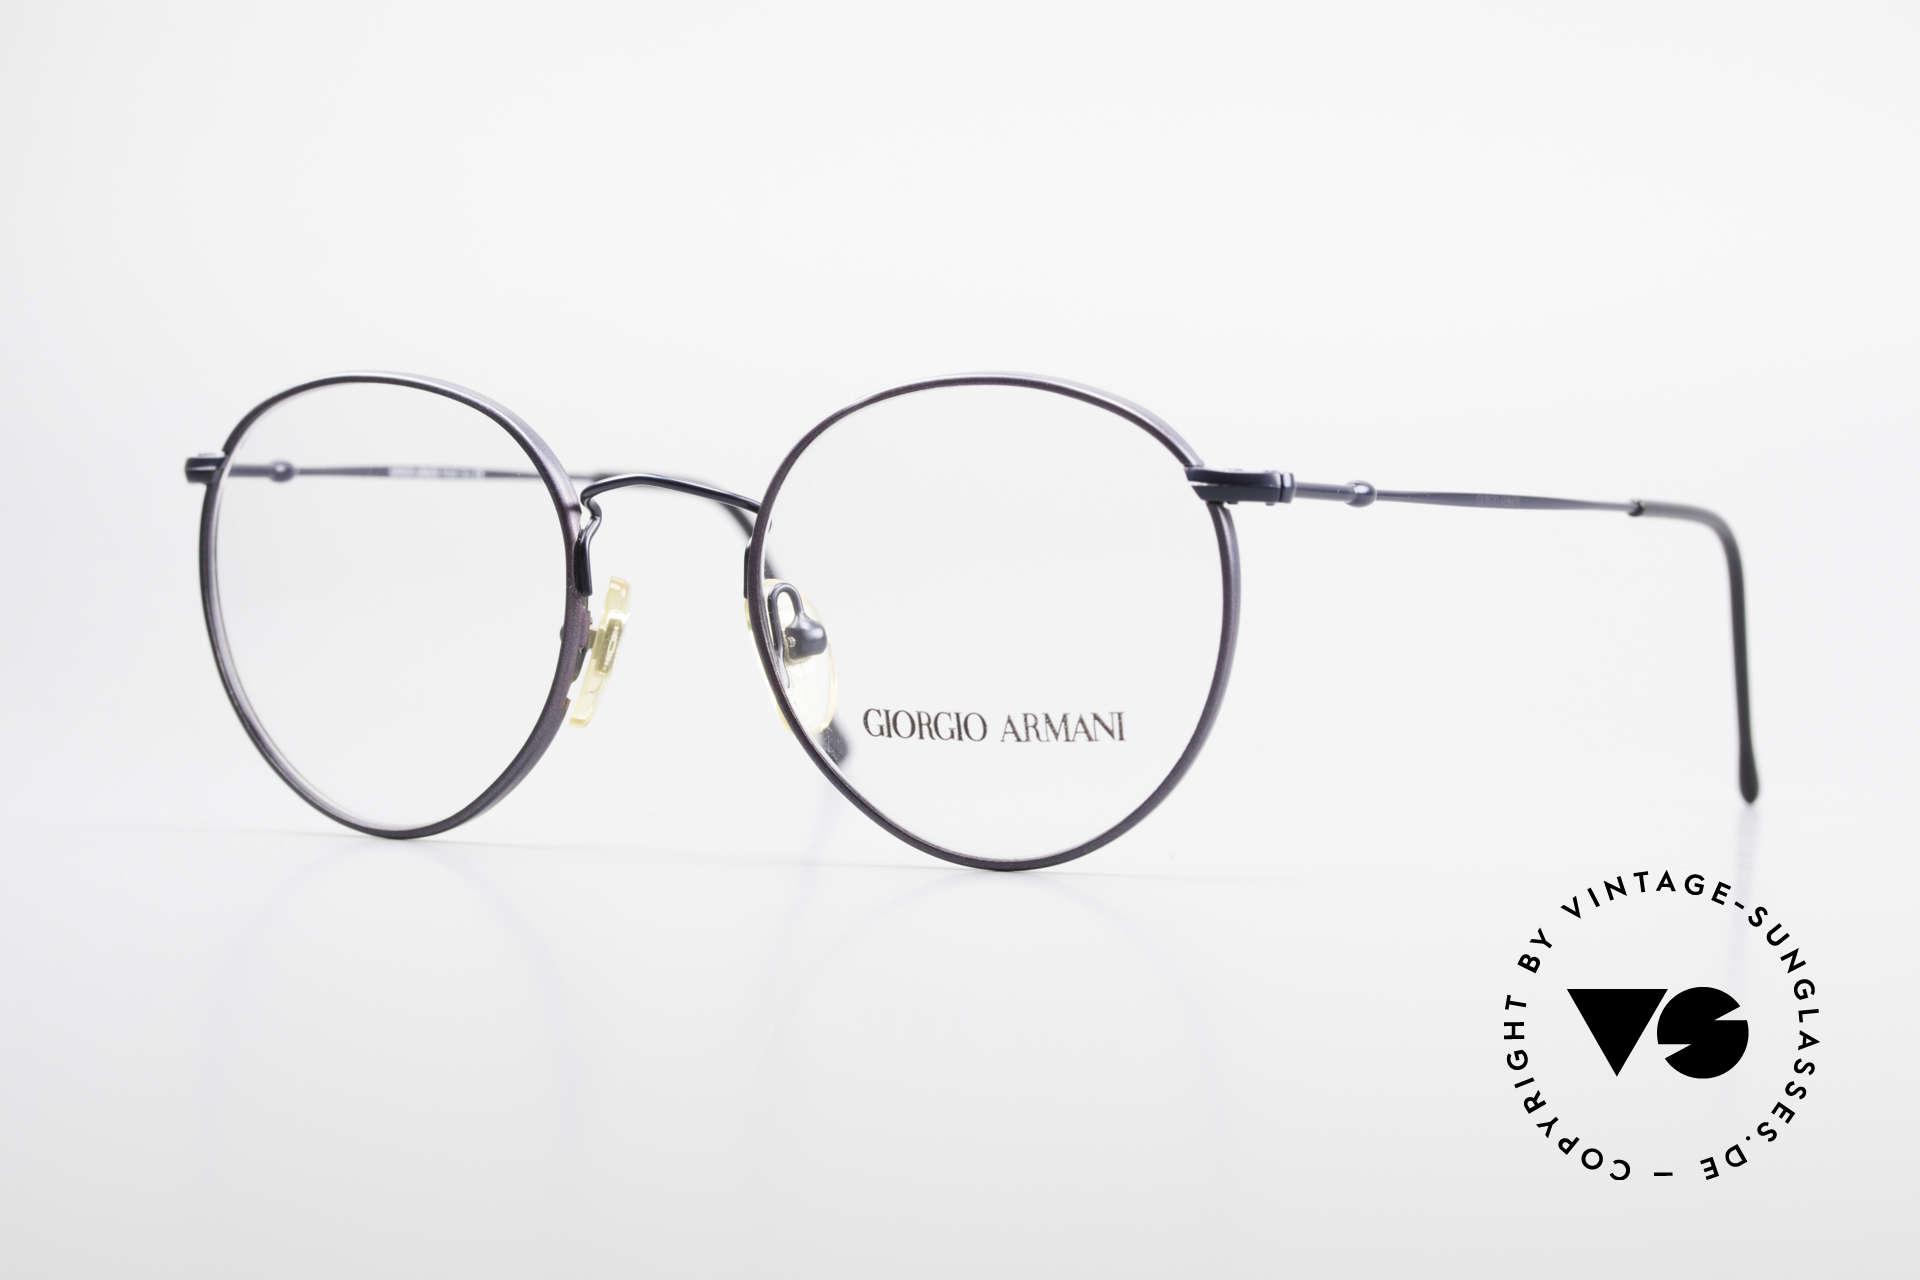 Giorgio Armani 253 Panto Vintage Frame Classic, timeless vintage Giorgio Armani designer eyeglasses, Made for Men